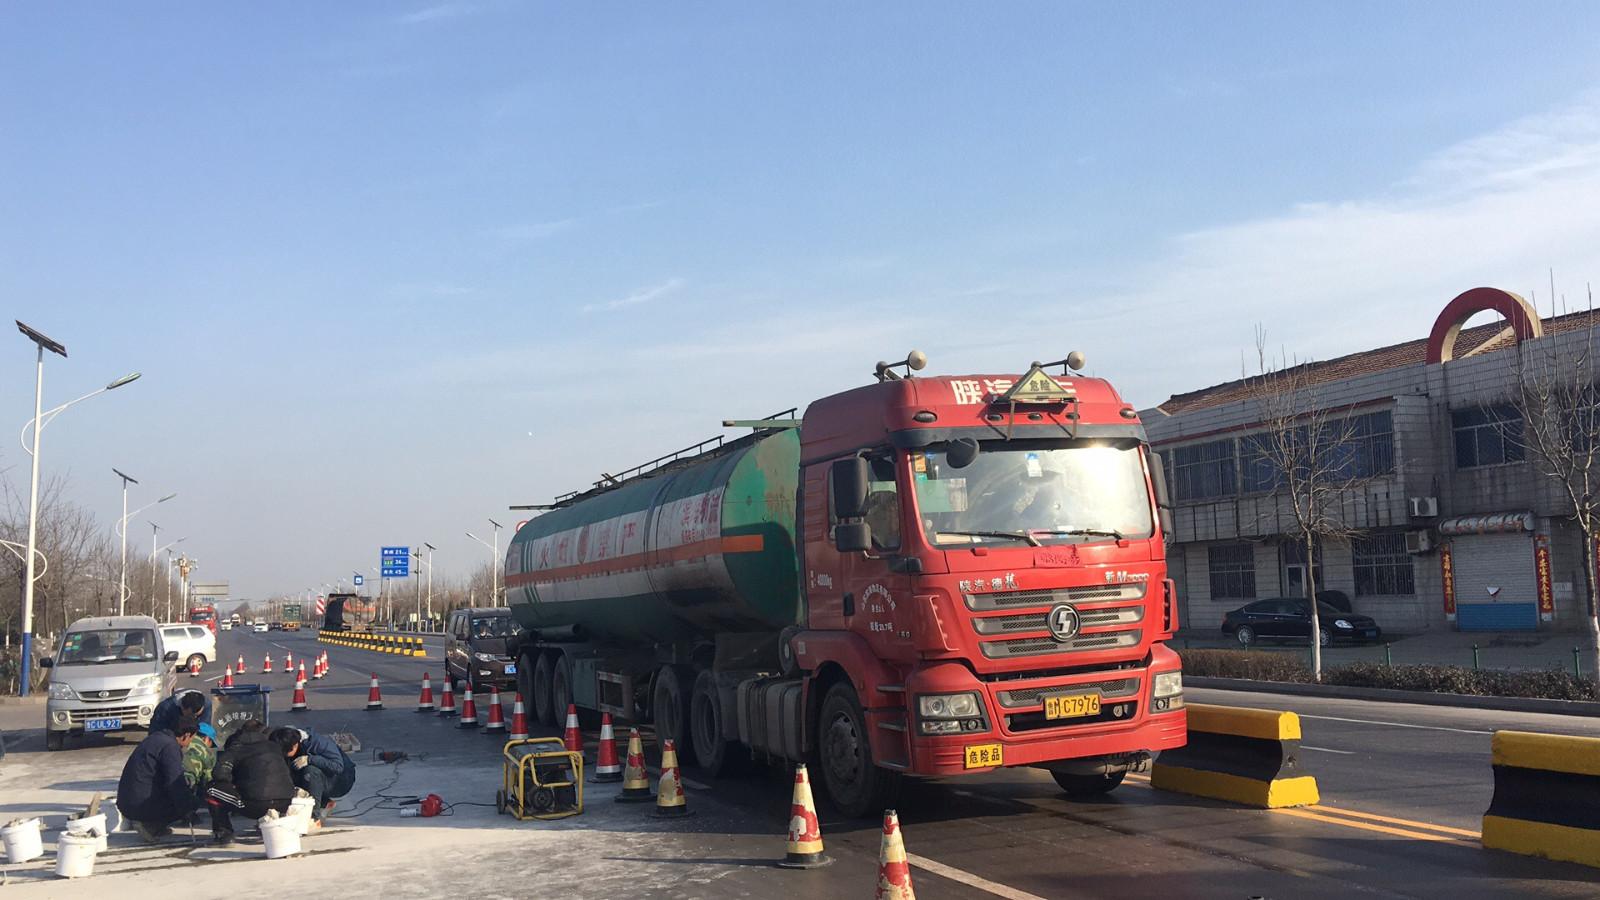 4,g15沈海高速公路601km—620km路段据分析,该路段货车在夜间行车时